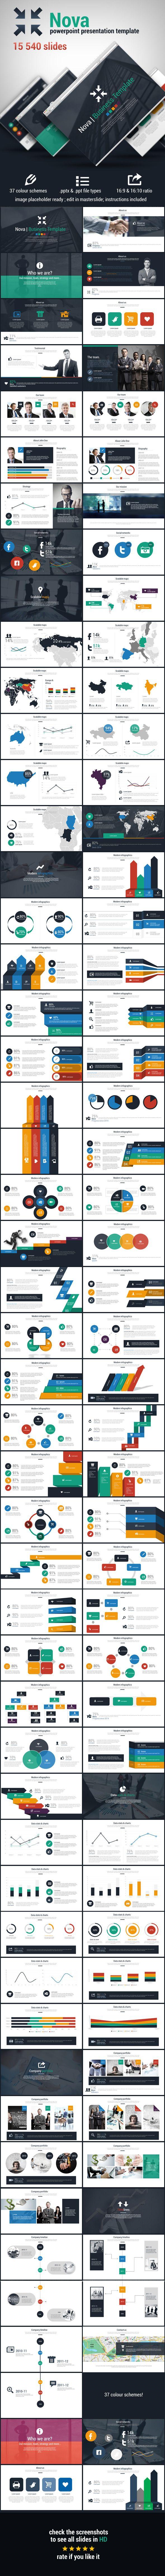 Nova Powerpoint Presentation Template #slides Download: http://graphicriver.net/item/nova-powerpoint-presentation-template/11253181?ref=ksioks